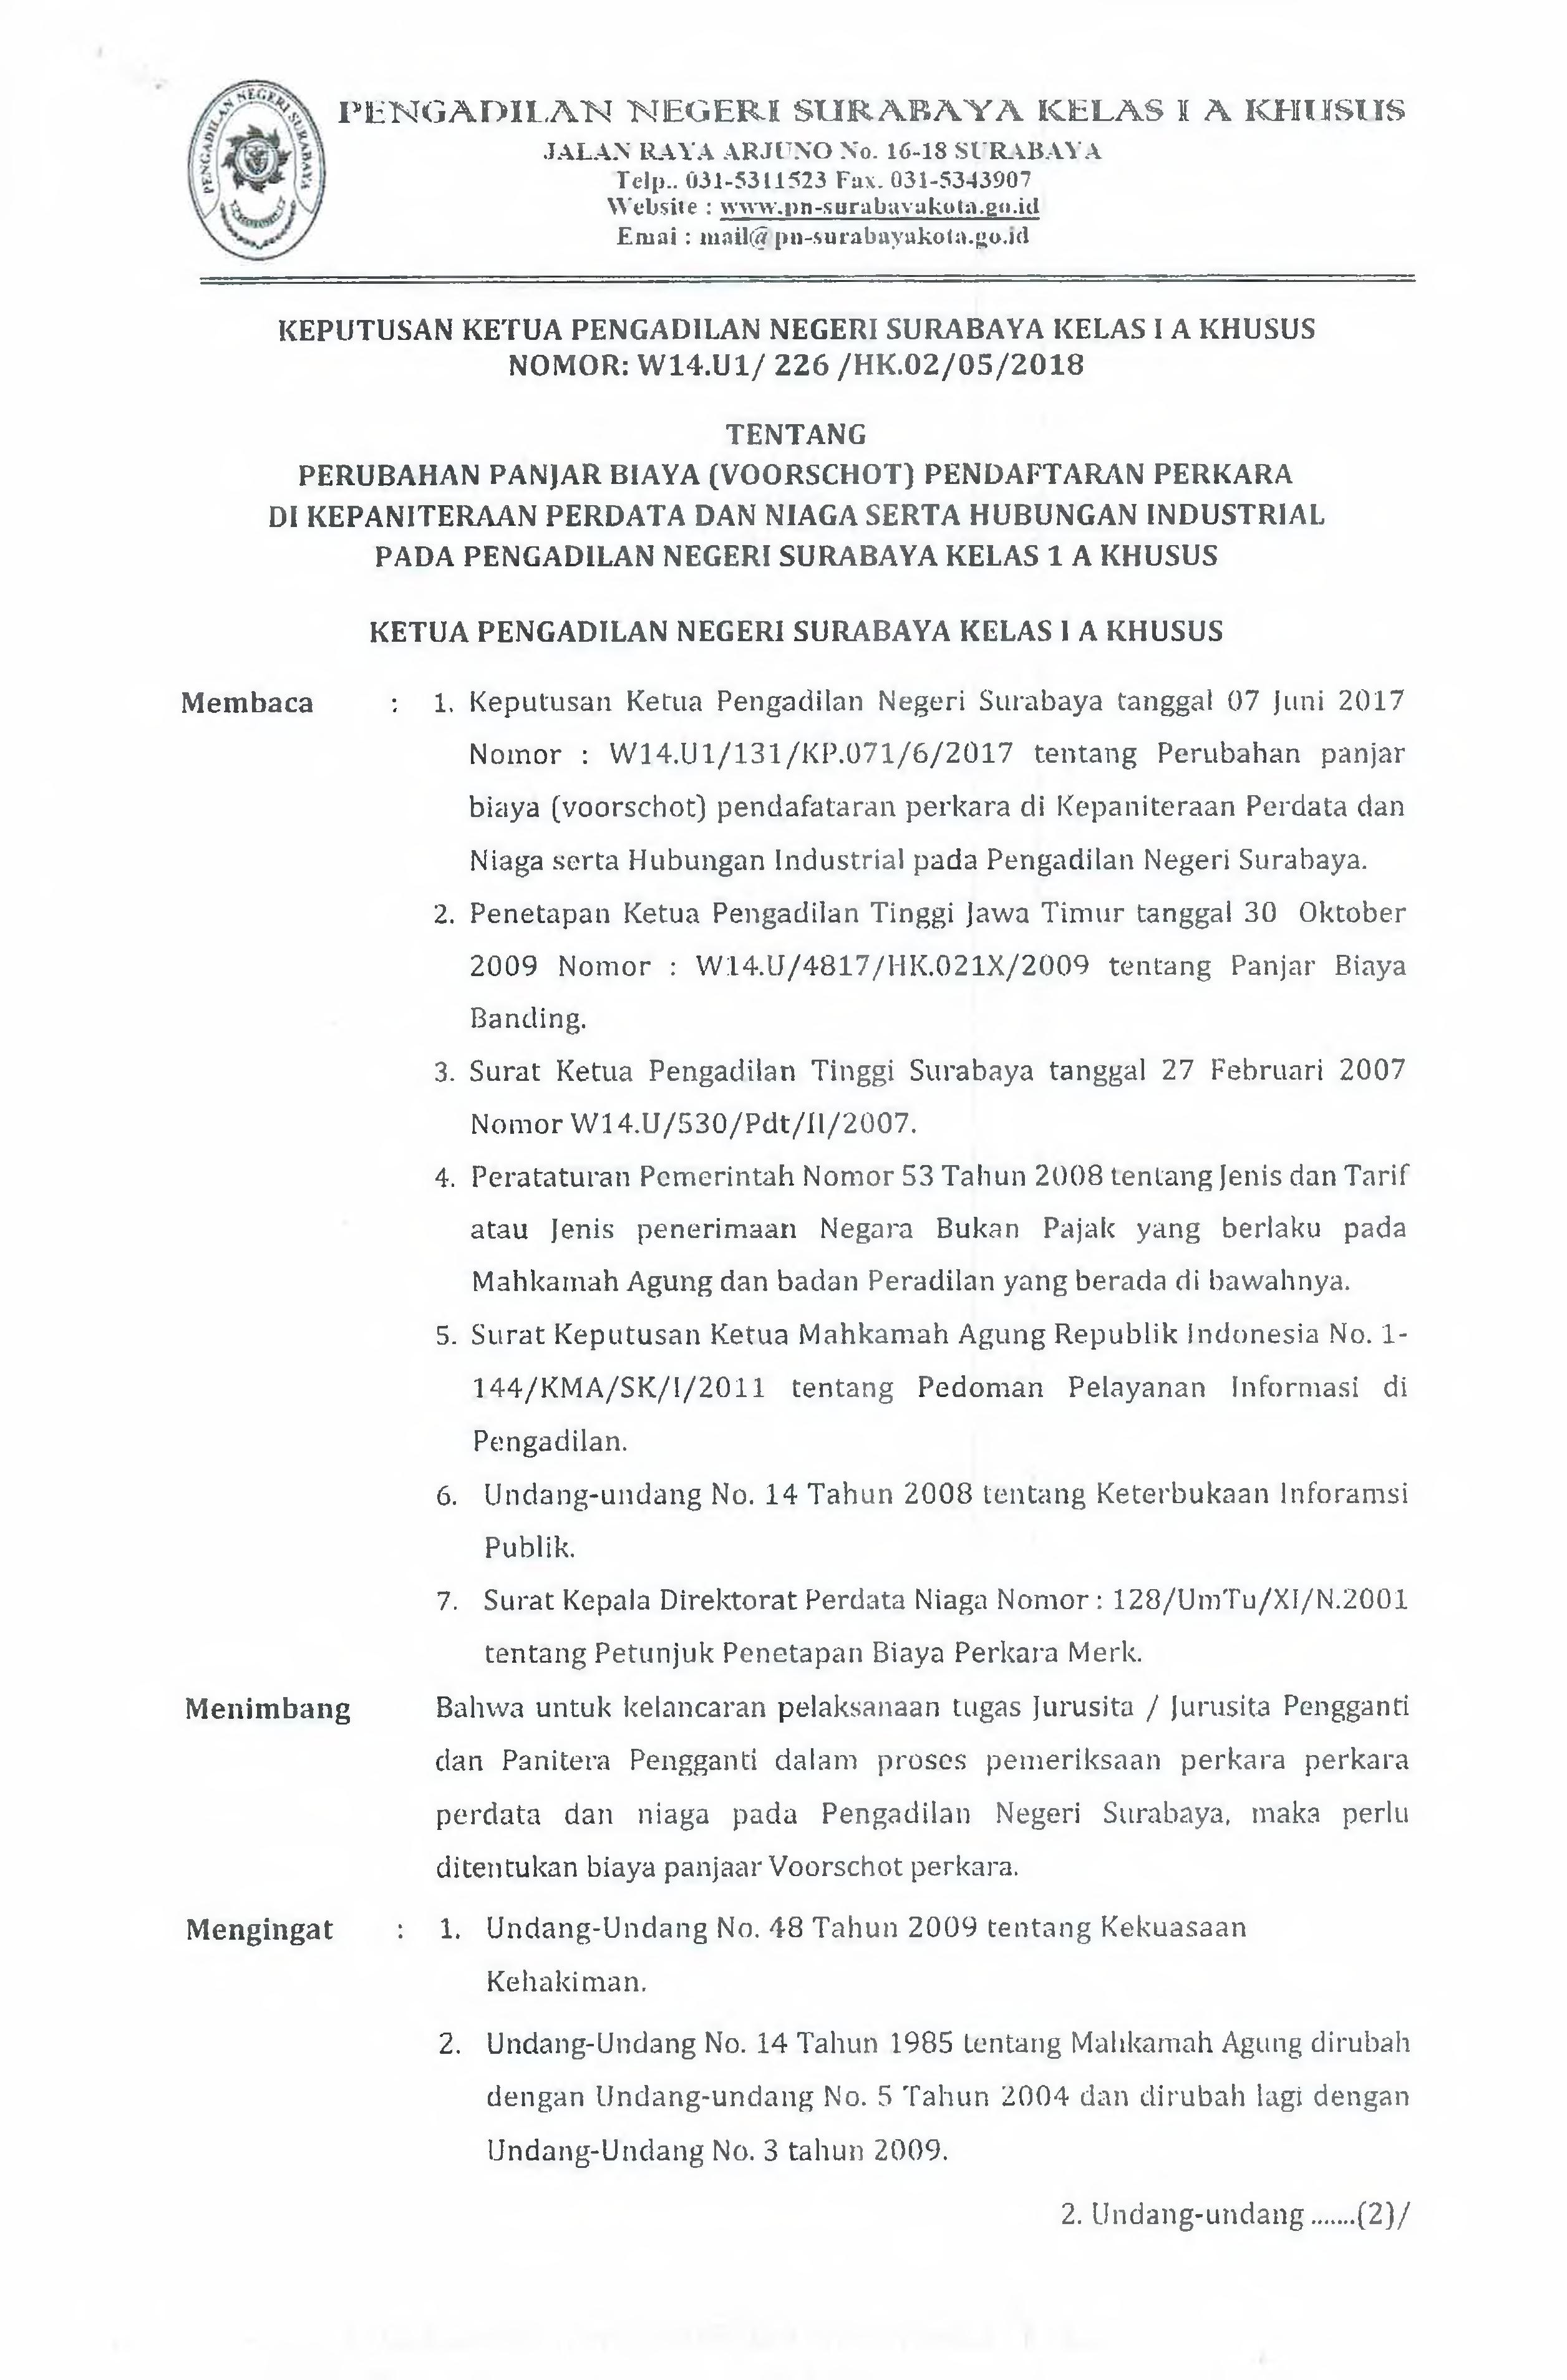 Panjar Biaya Pengadilan Negeri Surabaya